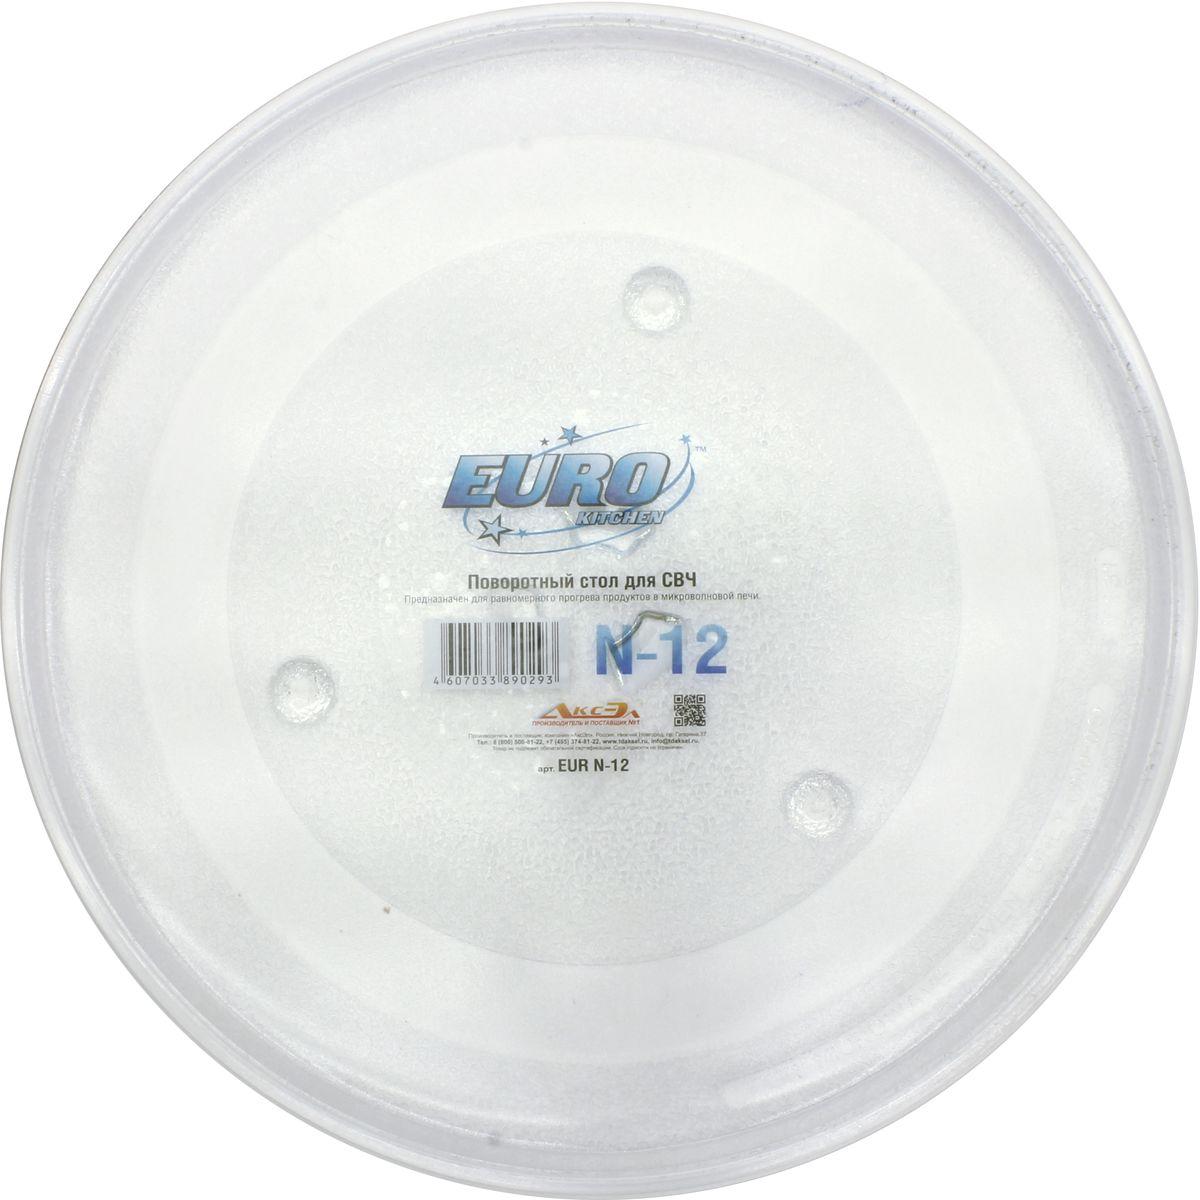 Euro Kitchen N-12 тарелка для СВЧN-12Универсальная тарелка N-12 для микроволновой печи с куплером. Диаметр тарелки 298 мм. Изготовлена из специального жаропрочного стекла. Предназначена для равномерного разогрева продуктов в микроволновой печи.Подходит для брендов:Aeg, Airhot, Amica, Ardo, Ariston, Asko, Atlanta, Aurora, Ava, Barazza, Bauknecht, Bbk, Beko, Bomann, Bork, Bosch, Brandt, Candy, Cata, Centek, Clatronic, Daewoo, De dietrich, Delfa, Electrolux, Elenberg, Ergo, Erisson, Eurotec, Fagor, Fimar, Foster, Franke, Fulgor, Fusion, Gaggenau, Gastrorag, Goldstar, Gorenje, Hankel, Hansa, Hilton, Horizont, Hurakan, Hyundai, Ilve, Indesit, Kaiser, Kenmore, Kenwood, Korting, Kuppersberg, Kuppersbusch, Kamark, Keran, Lg, Liberton, Liberty, Maxwell, Menumaster, Midea, Miele, Moulinex, Mystery, Neff, Oursson, Panasonic, Proficook, Rainford, Redmond, Rolsen, Samsung, Saturn, Scarlett, Sencor, Sharp, Siemens, Simfer, Sinbo, Sirman, Smeg, Supra, Teka, Thomson, Toshiba, V-zug, Vasko, Vimar, Vitek, Vr, Weissgauff, West, Whirlpool, Zanussi, Zelmer, Zigmund&Shtain, Витязь, Рубин.